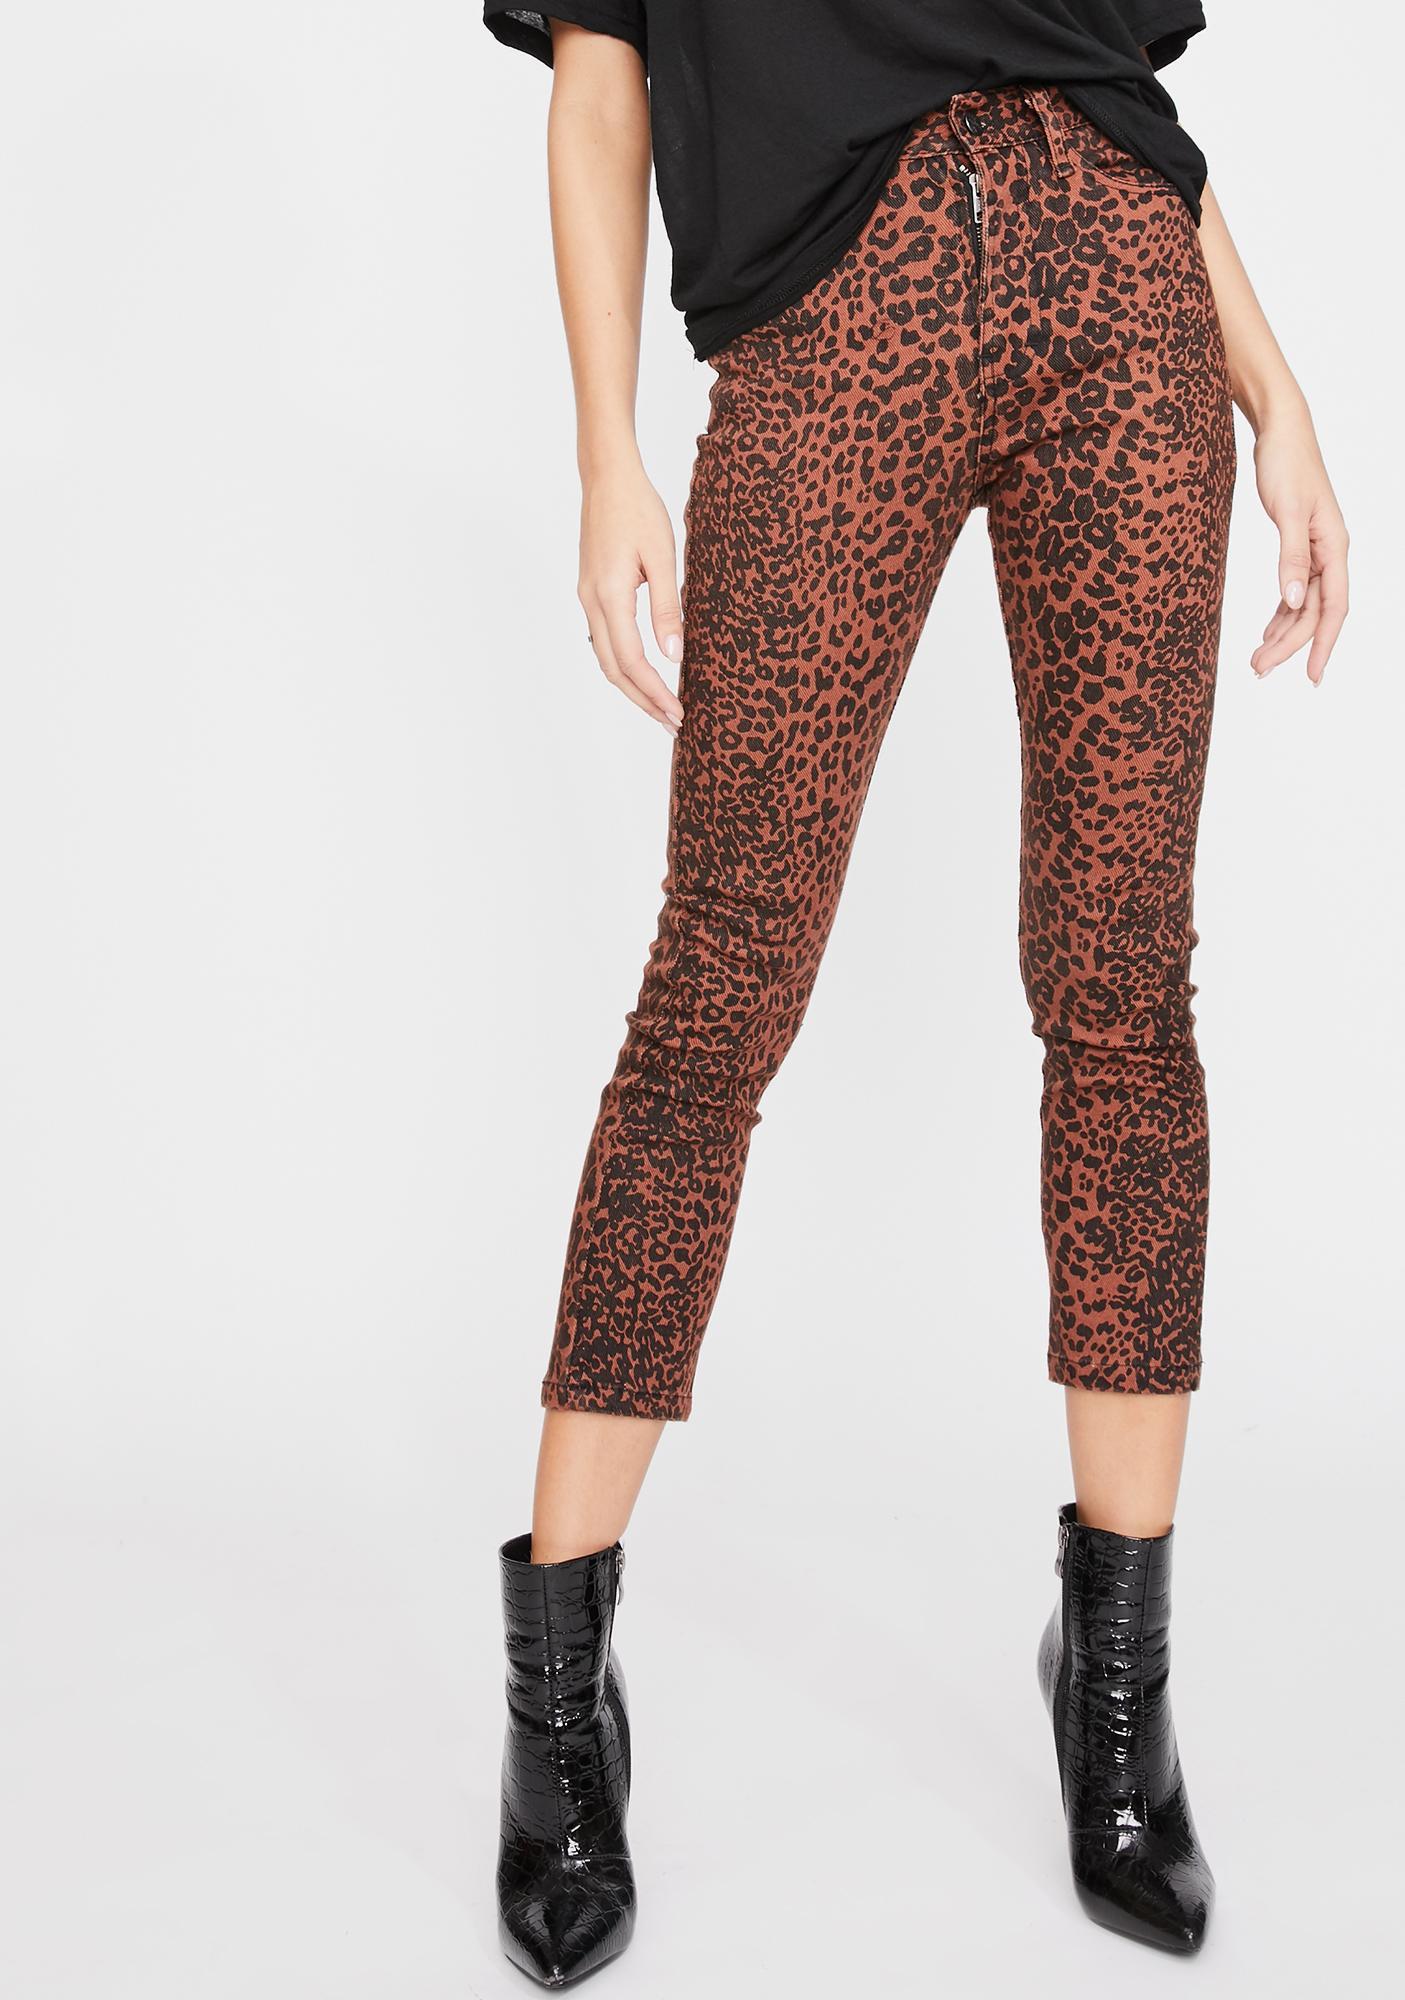 The People VS Wild Cat Bonnie Jeans